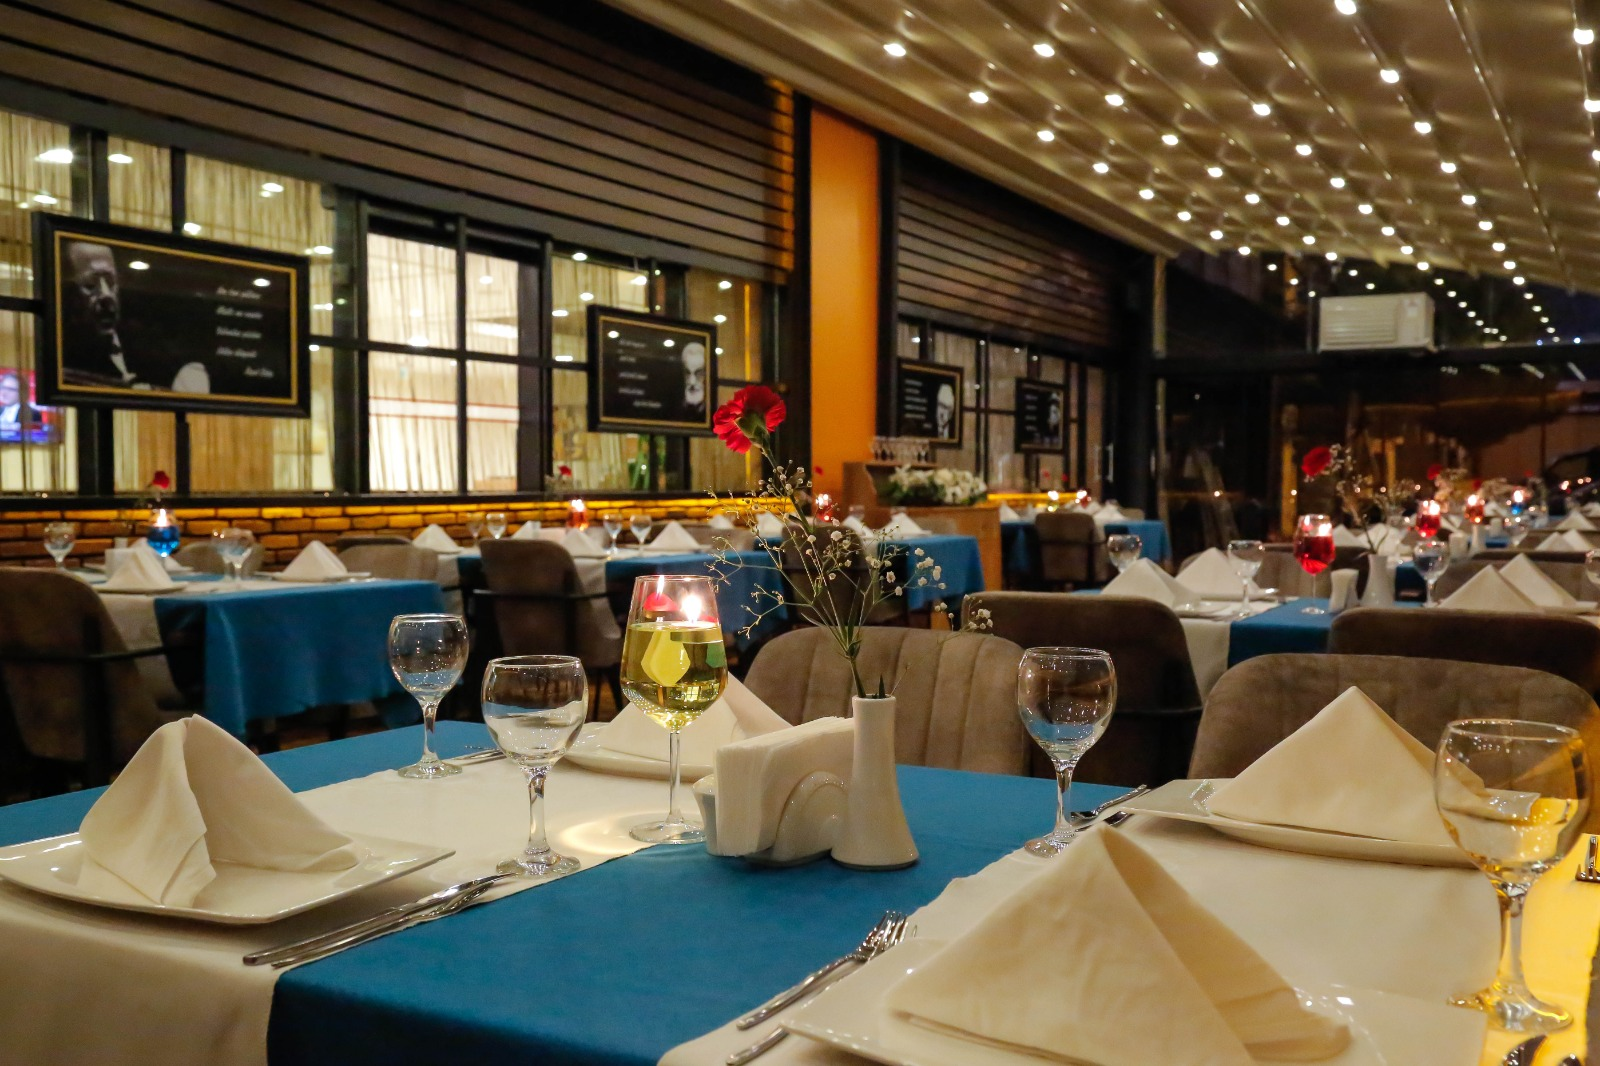 Yengeç Restaurant